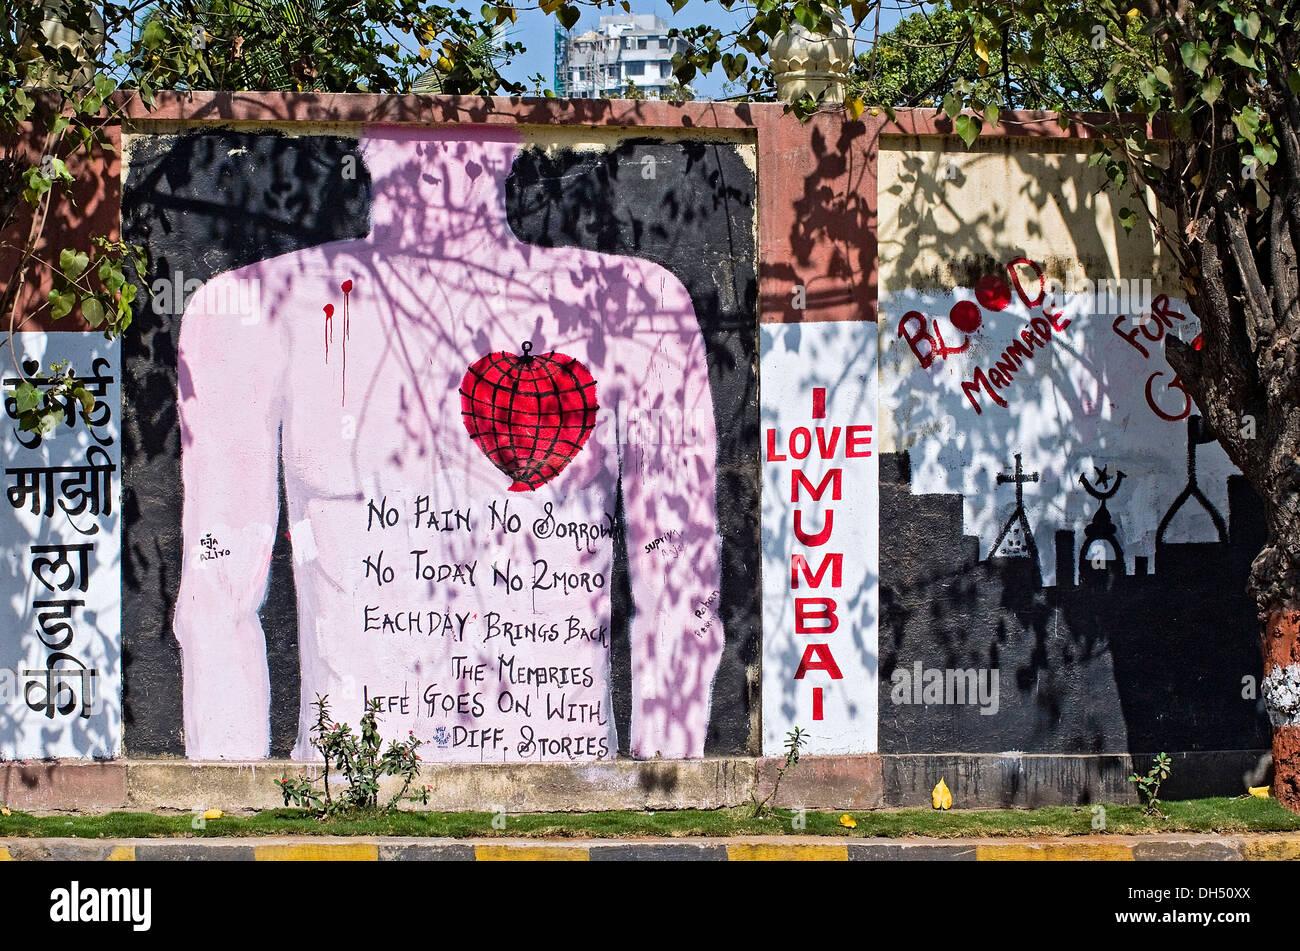 Wall painting about the terrorist attacks on 26.11.2008, Mumbai, India, Asia - Stock Image